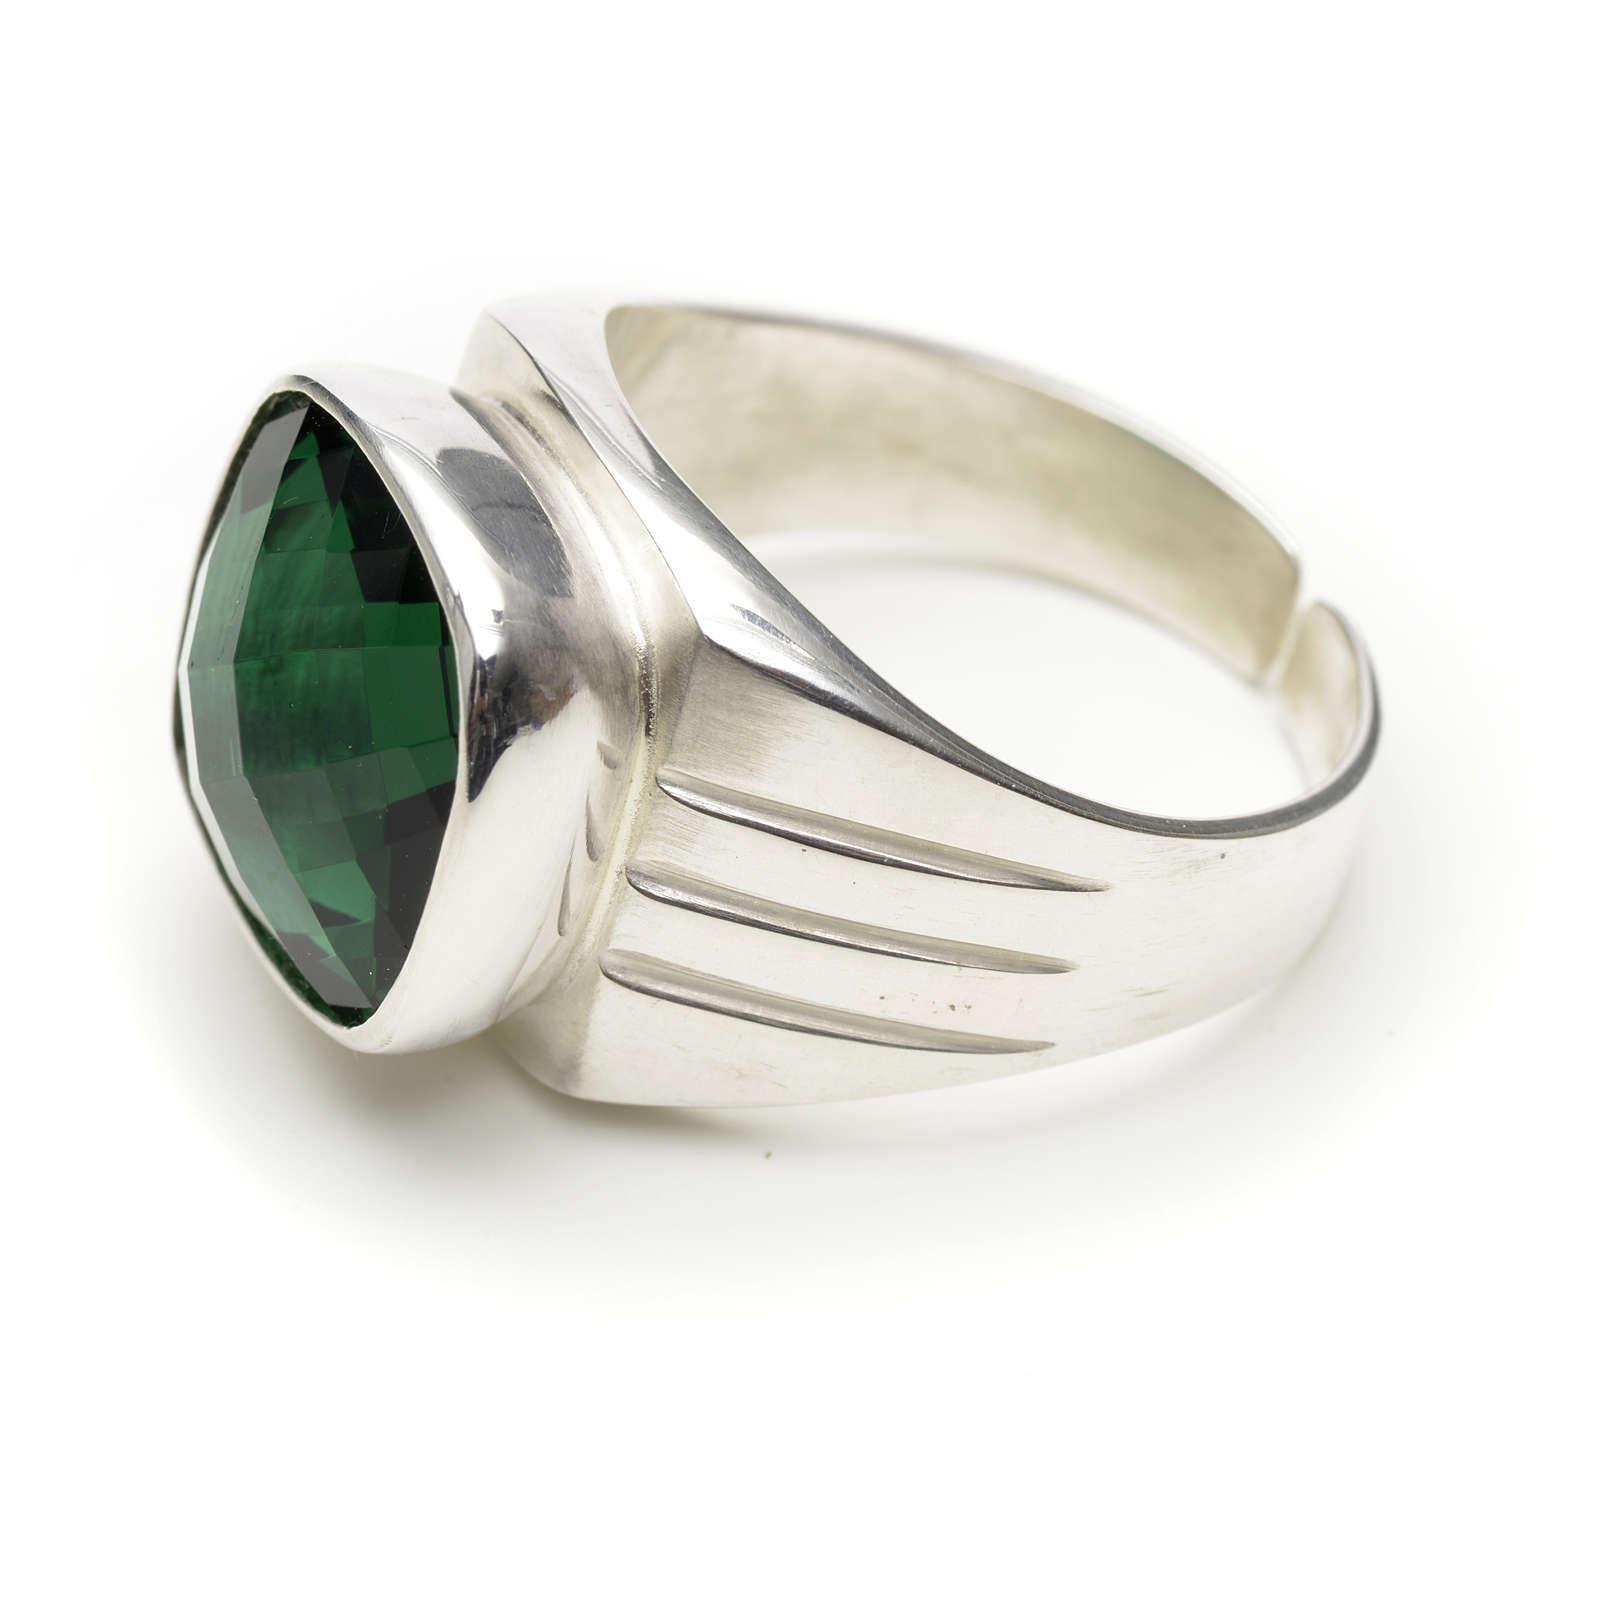 Anillo obispal plata 925 y cuarzo verde 3